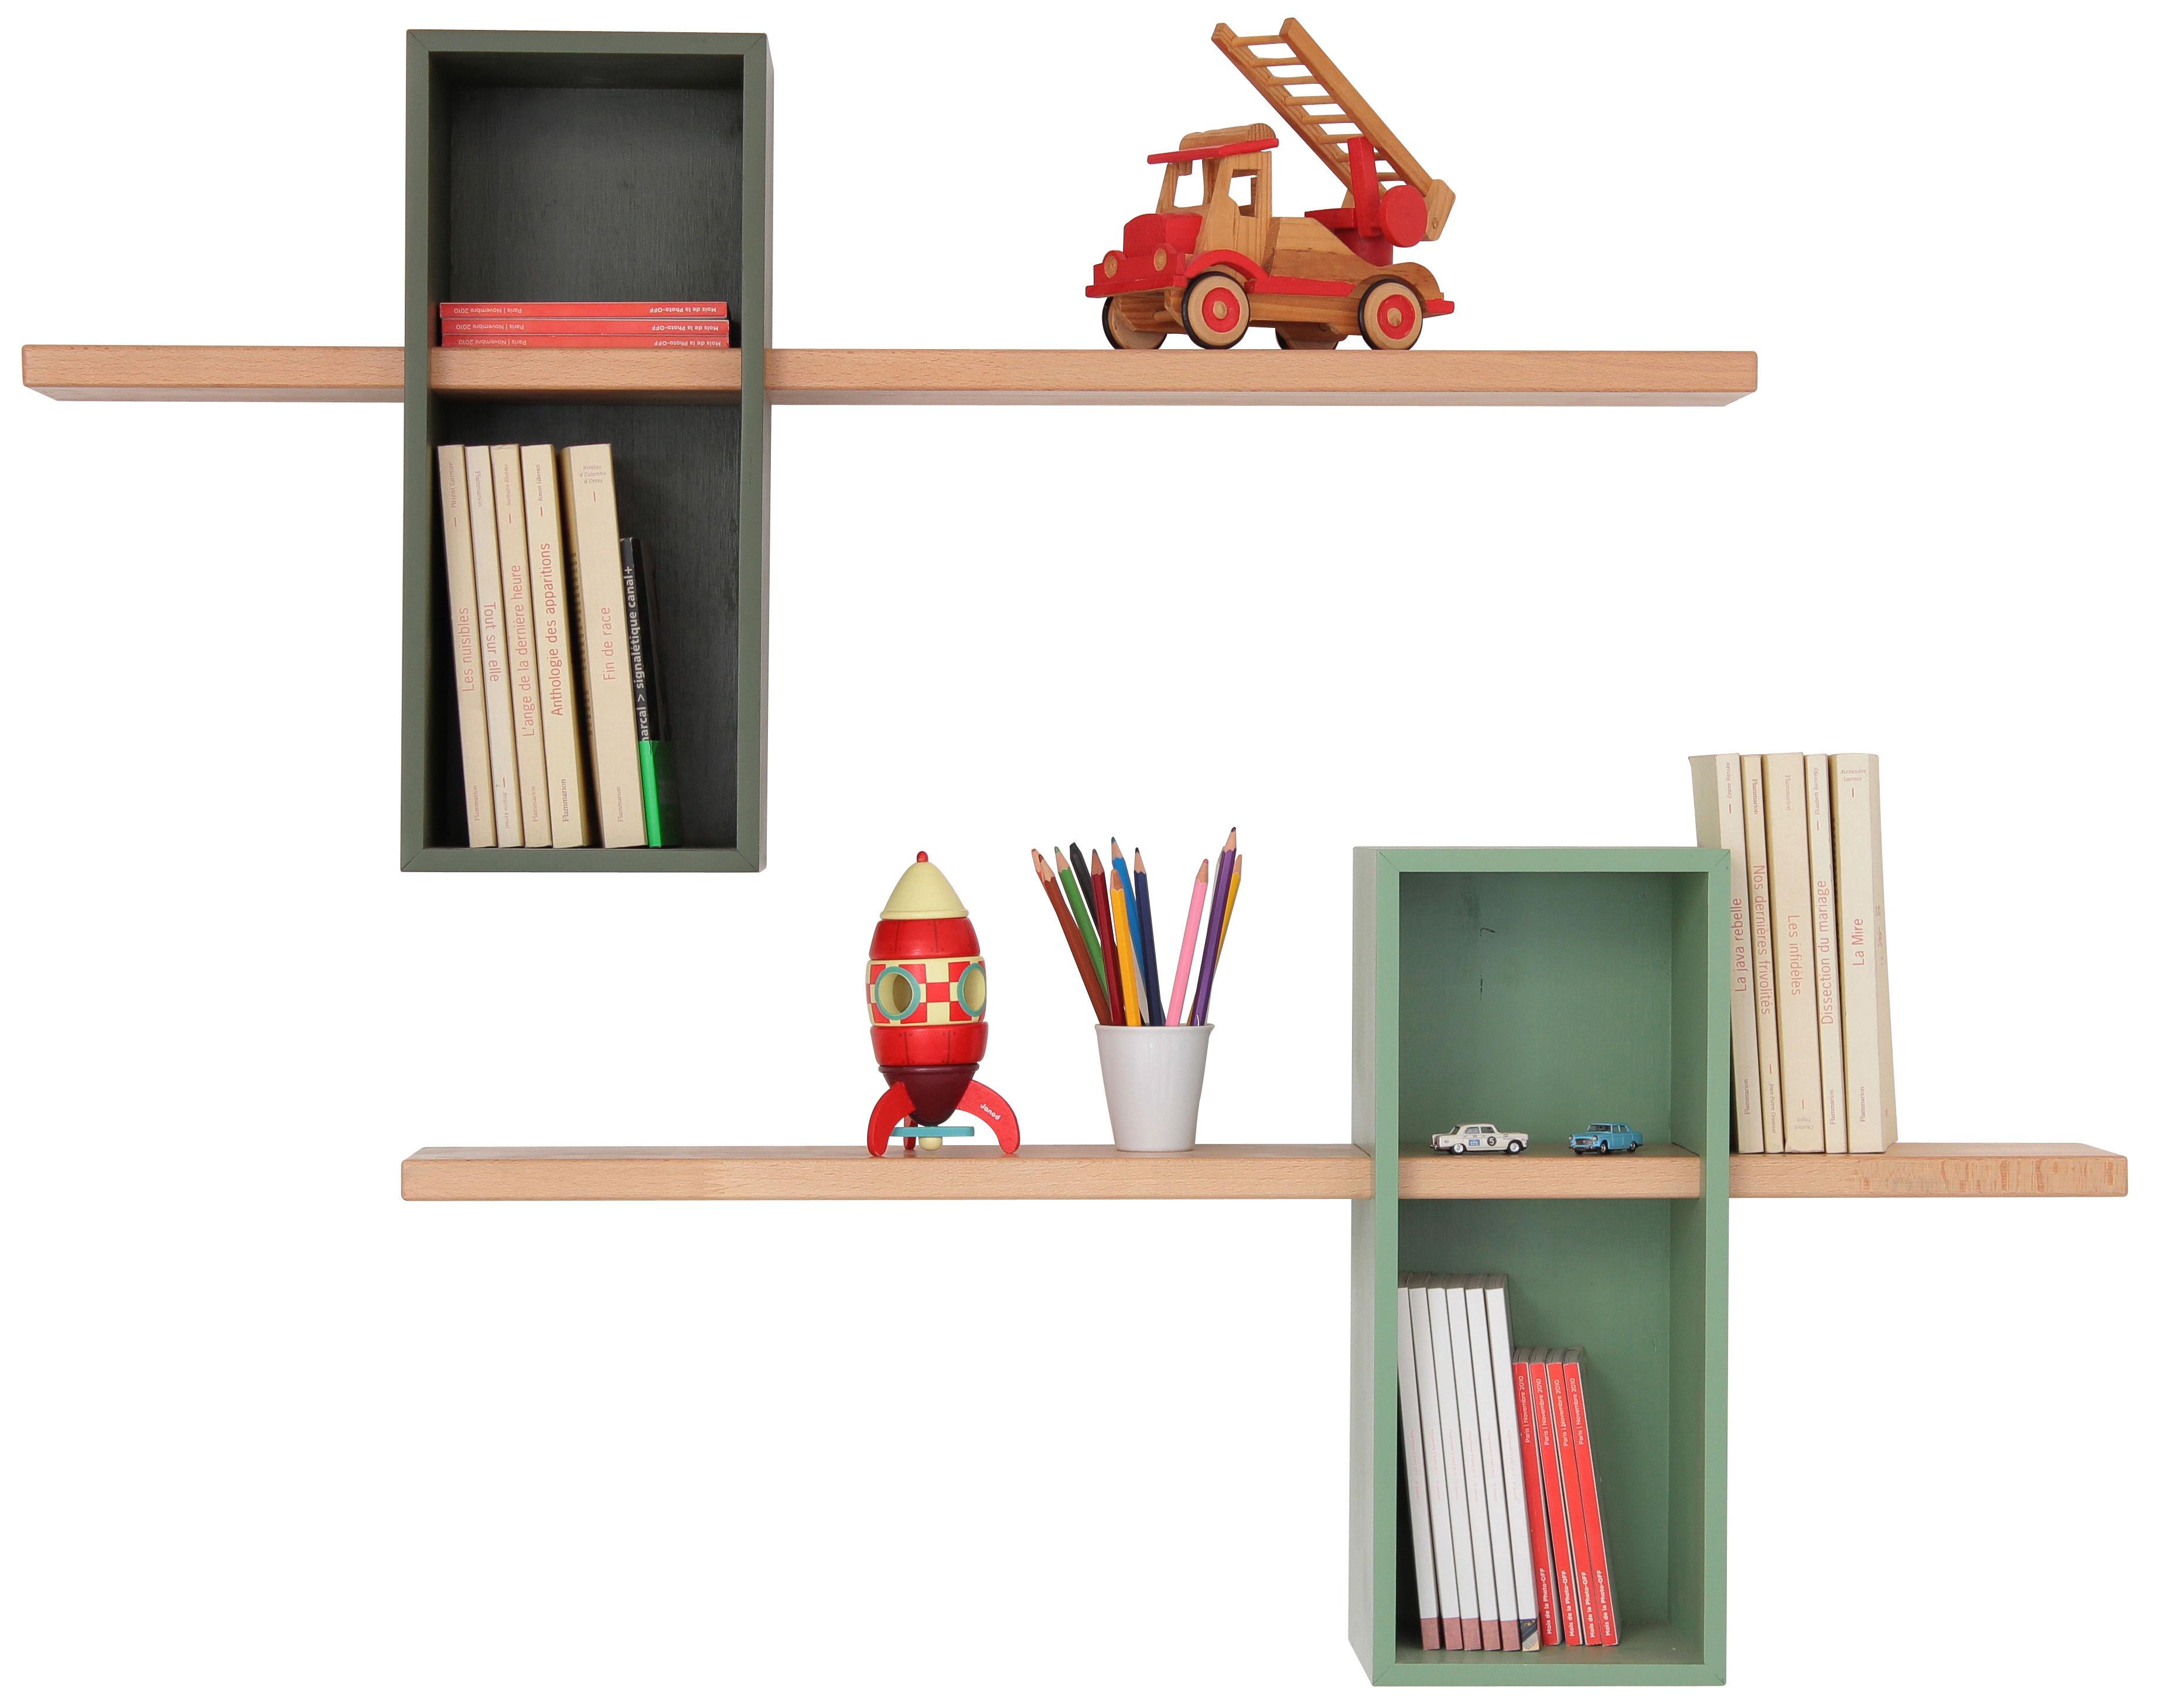 max xl regal einfach 2 boxen 2 regalbretter olivgr n hellgr n by compagnie made in. Black Bedroom Furniture Sets. Home Design Ideas